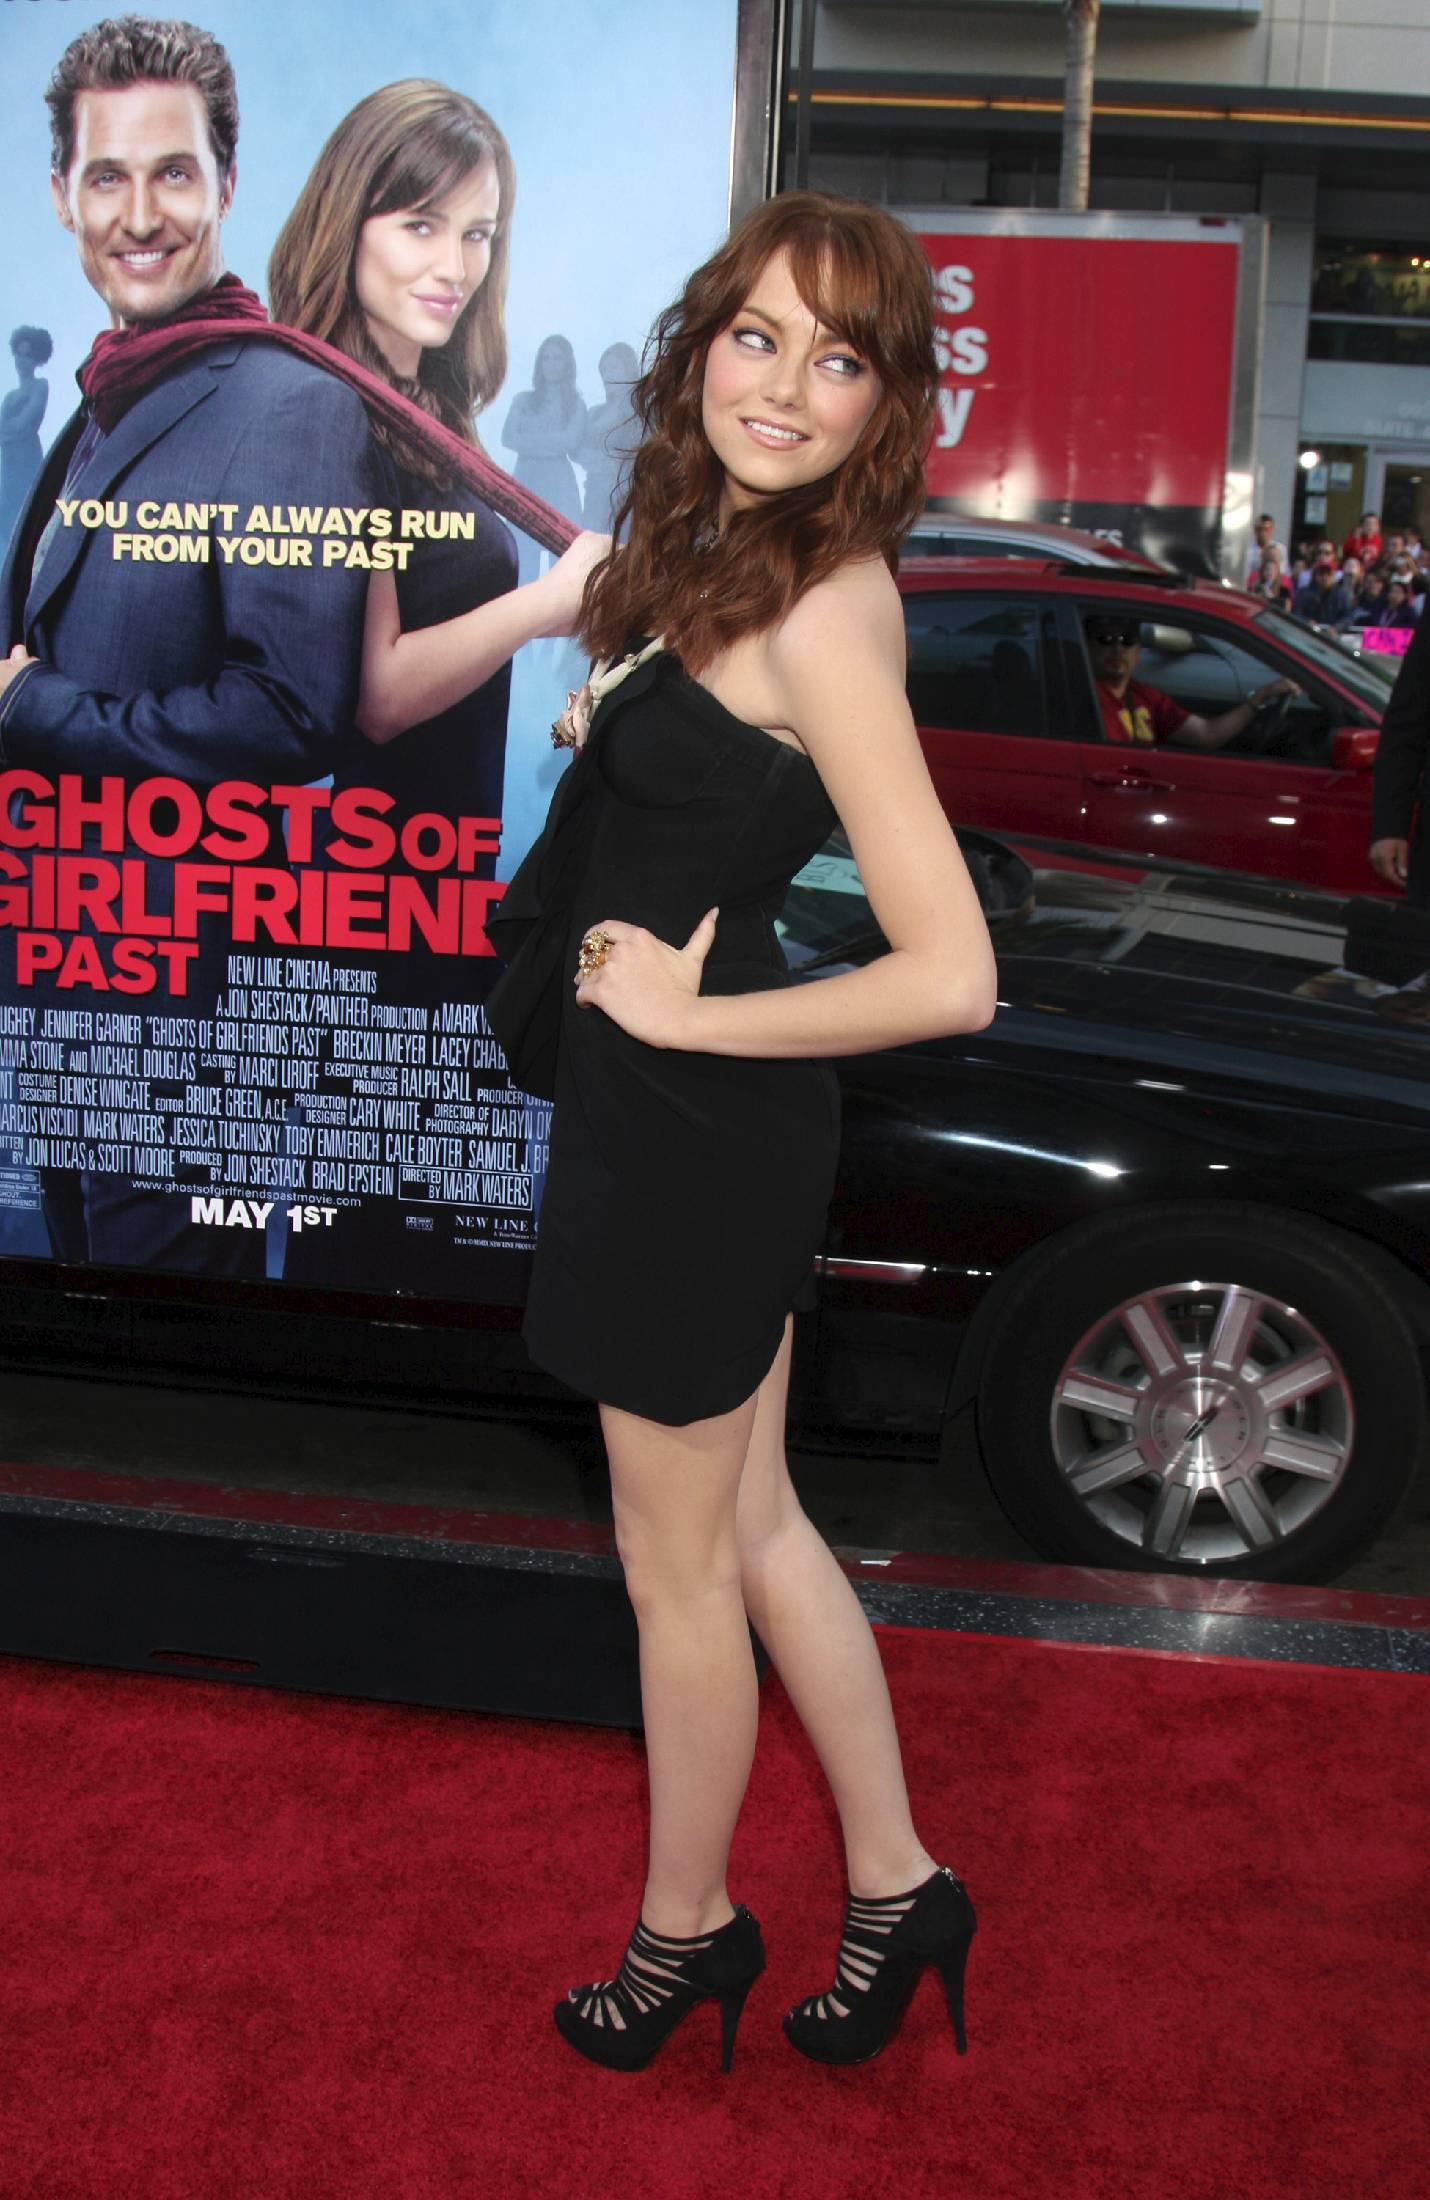 27664_emma_stone_ghosts_of_girlfriends_past_premiere_tikipeter_celebritycity_005_122_1lo.jpg